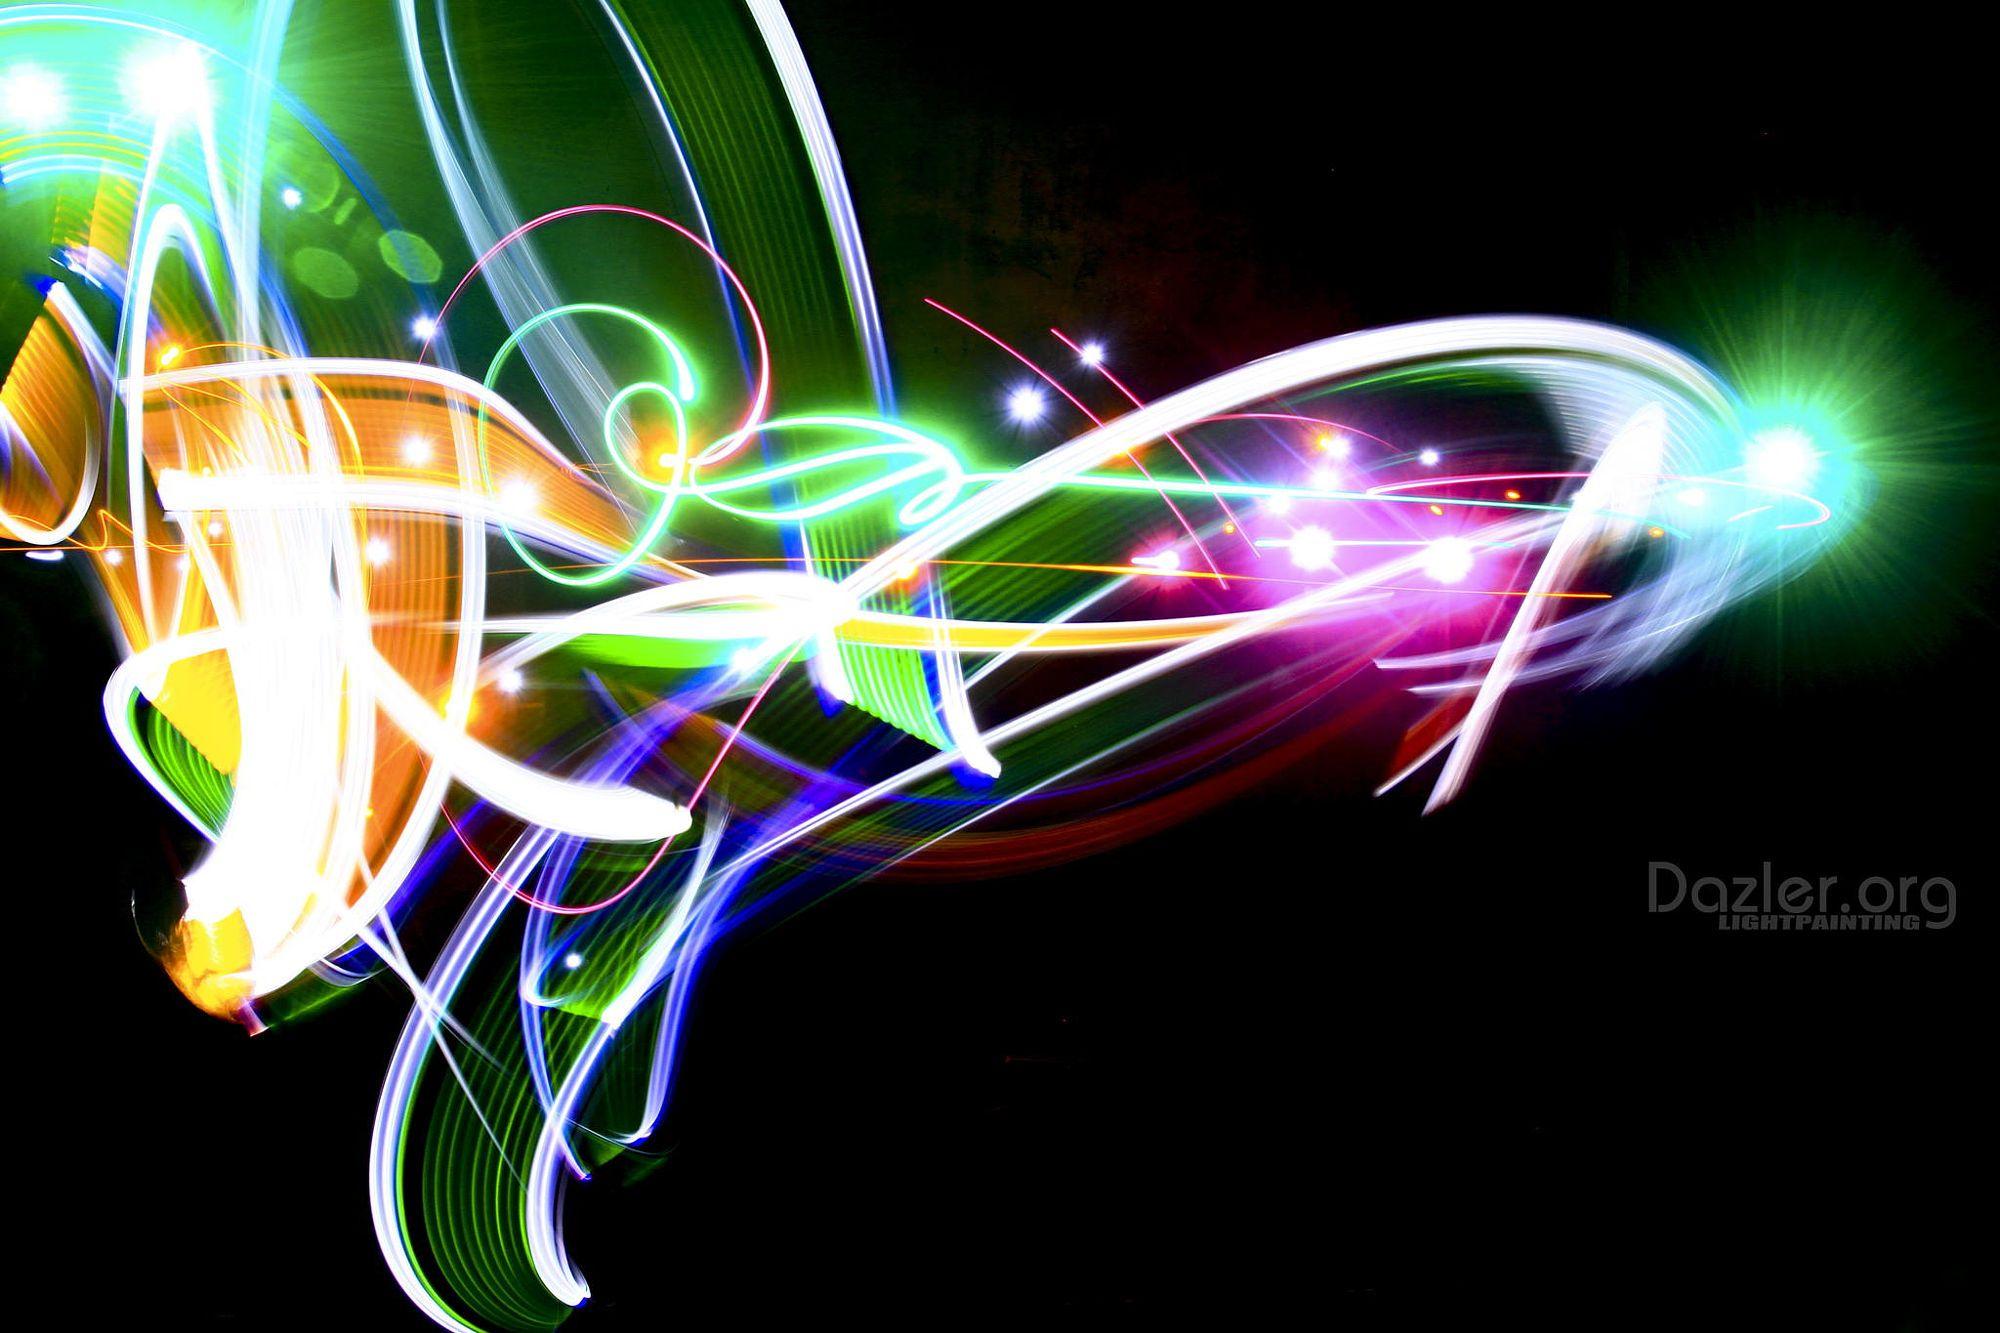 Audacity of huge by Dazler Lightpainting on 500px